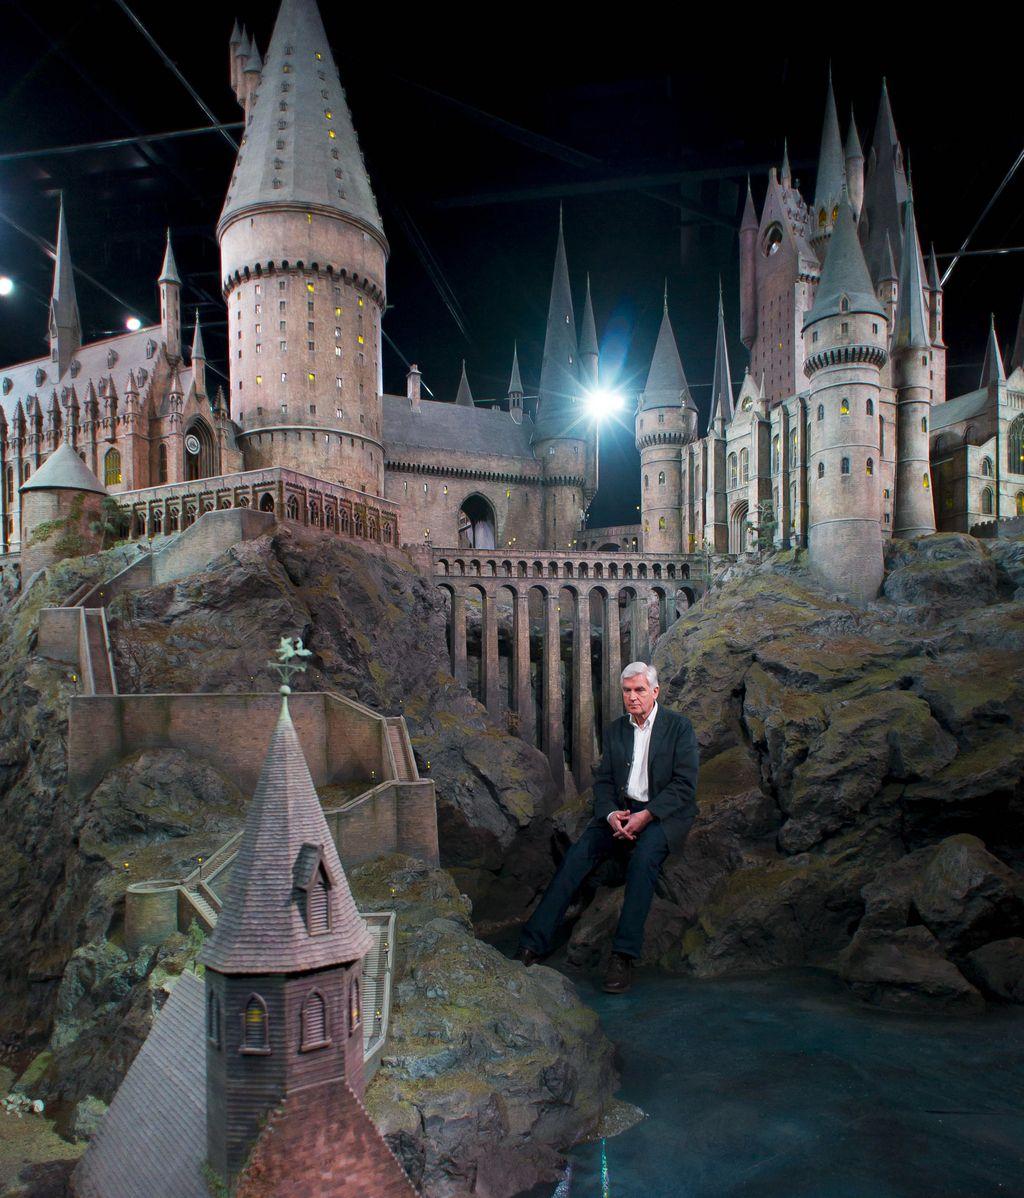 La pequeña magia del castillo de Harry Potter